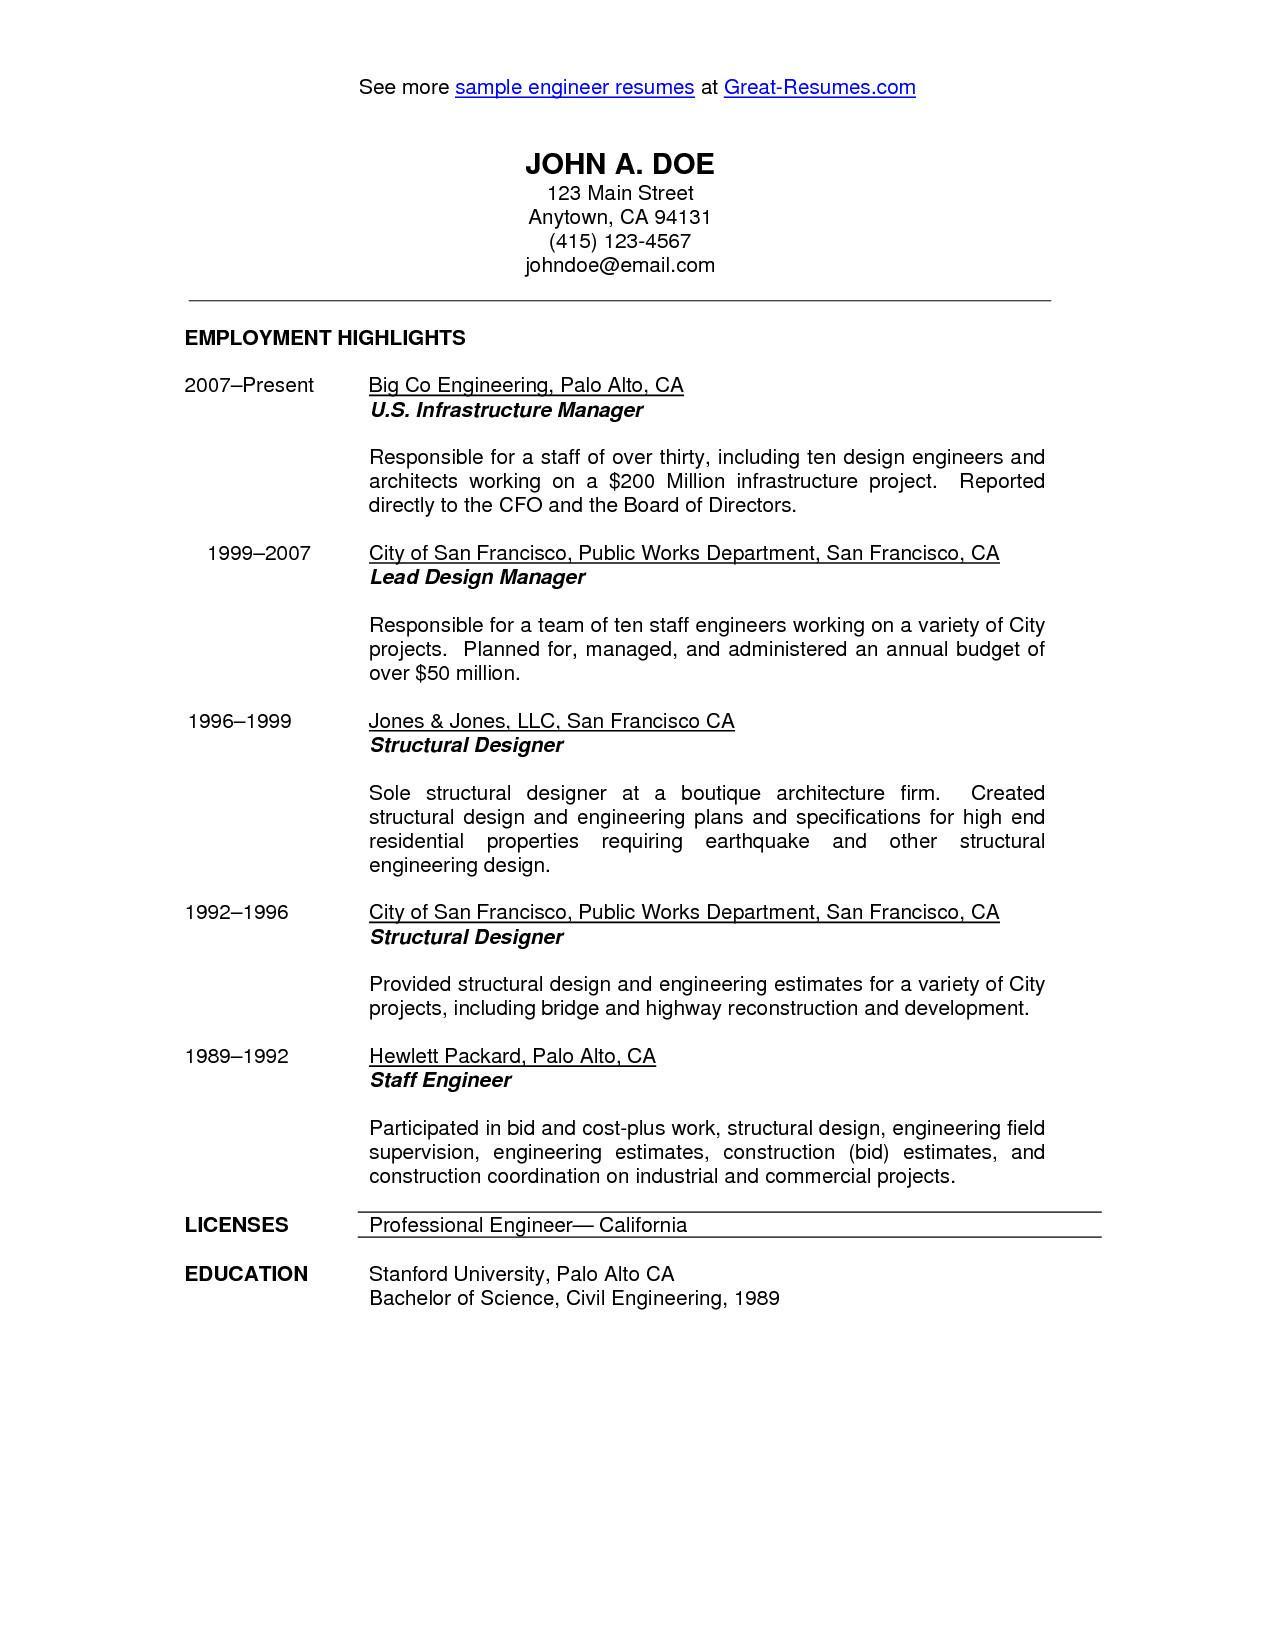 Civil Engineering Internship Resume Template